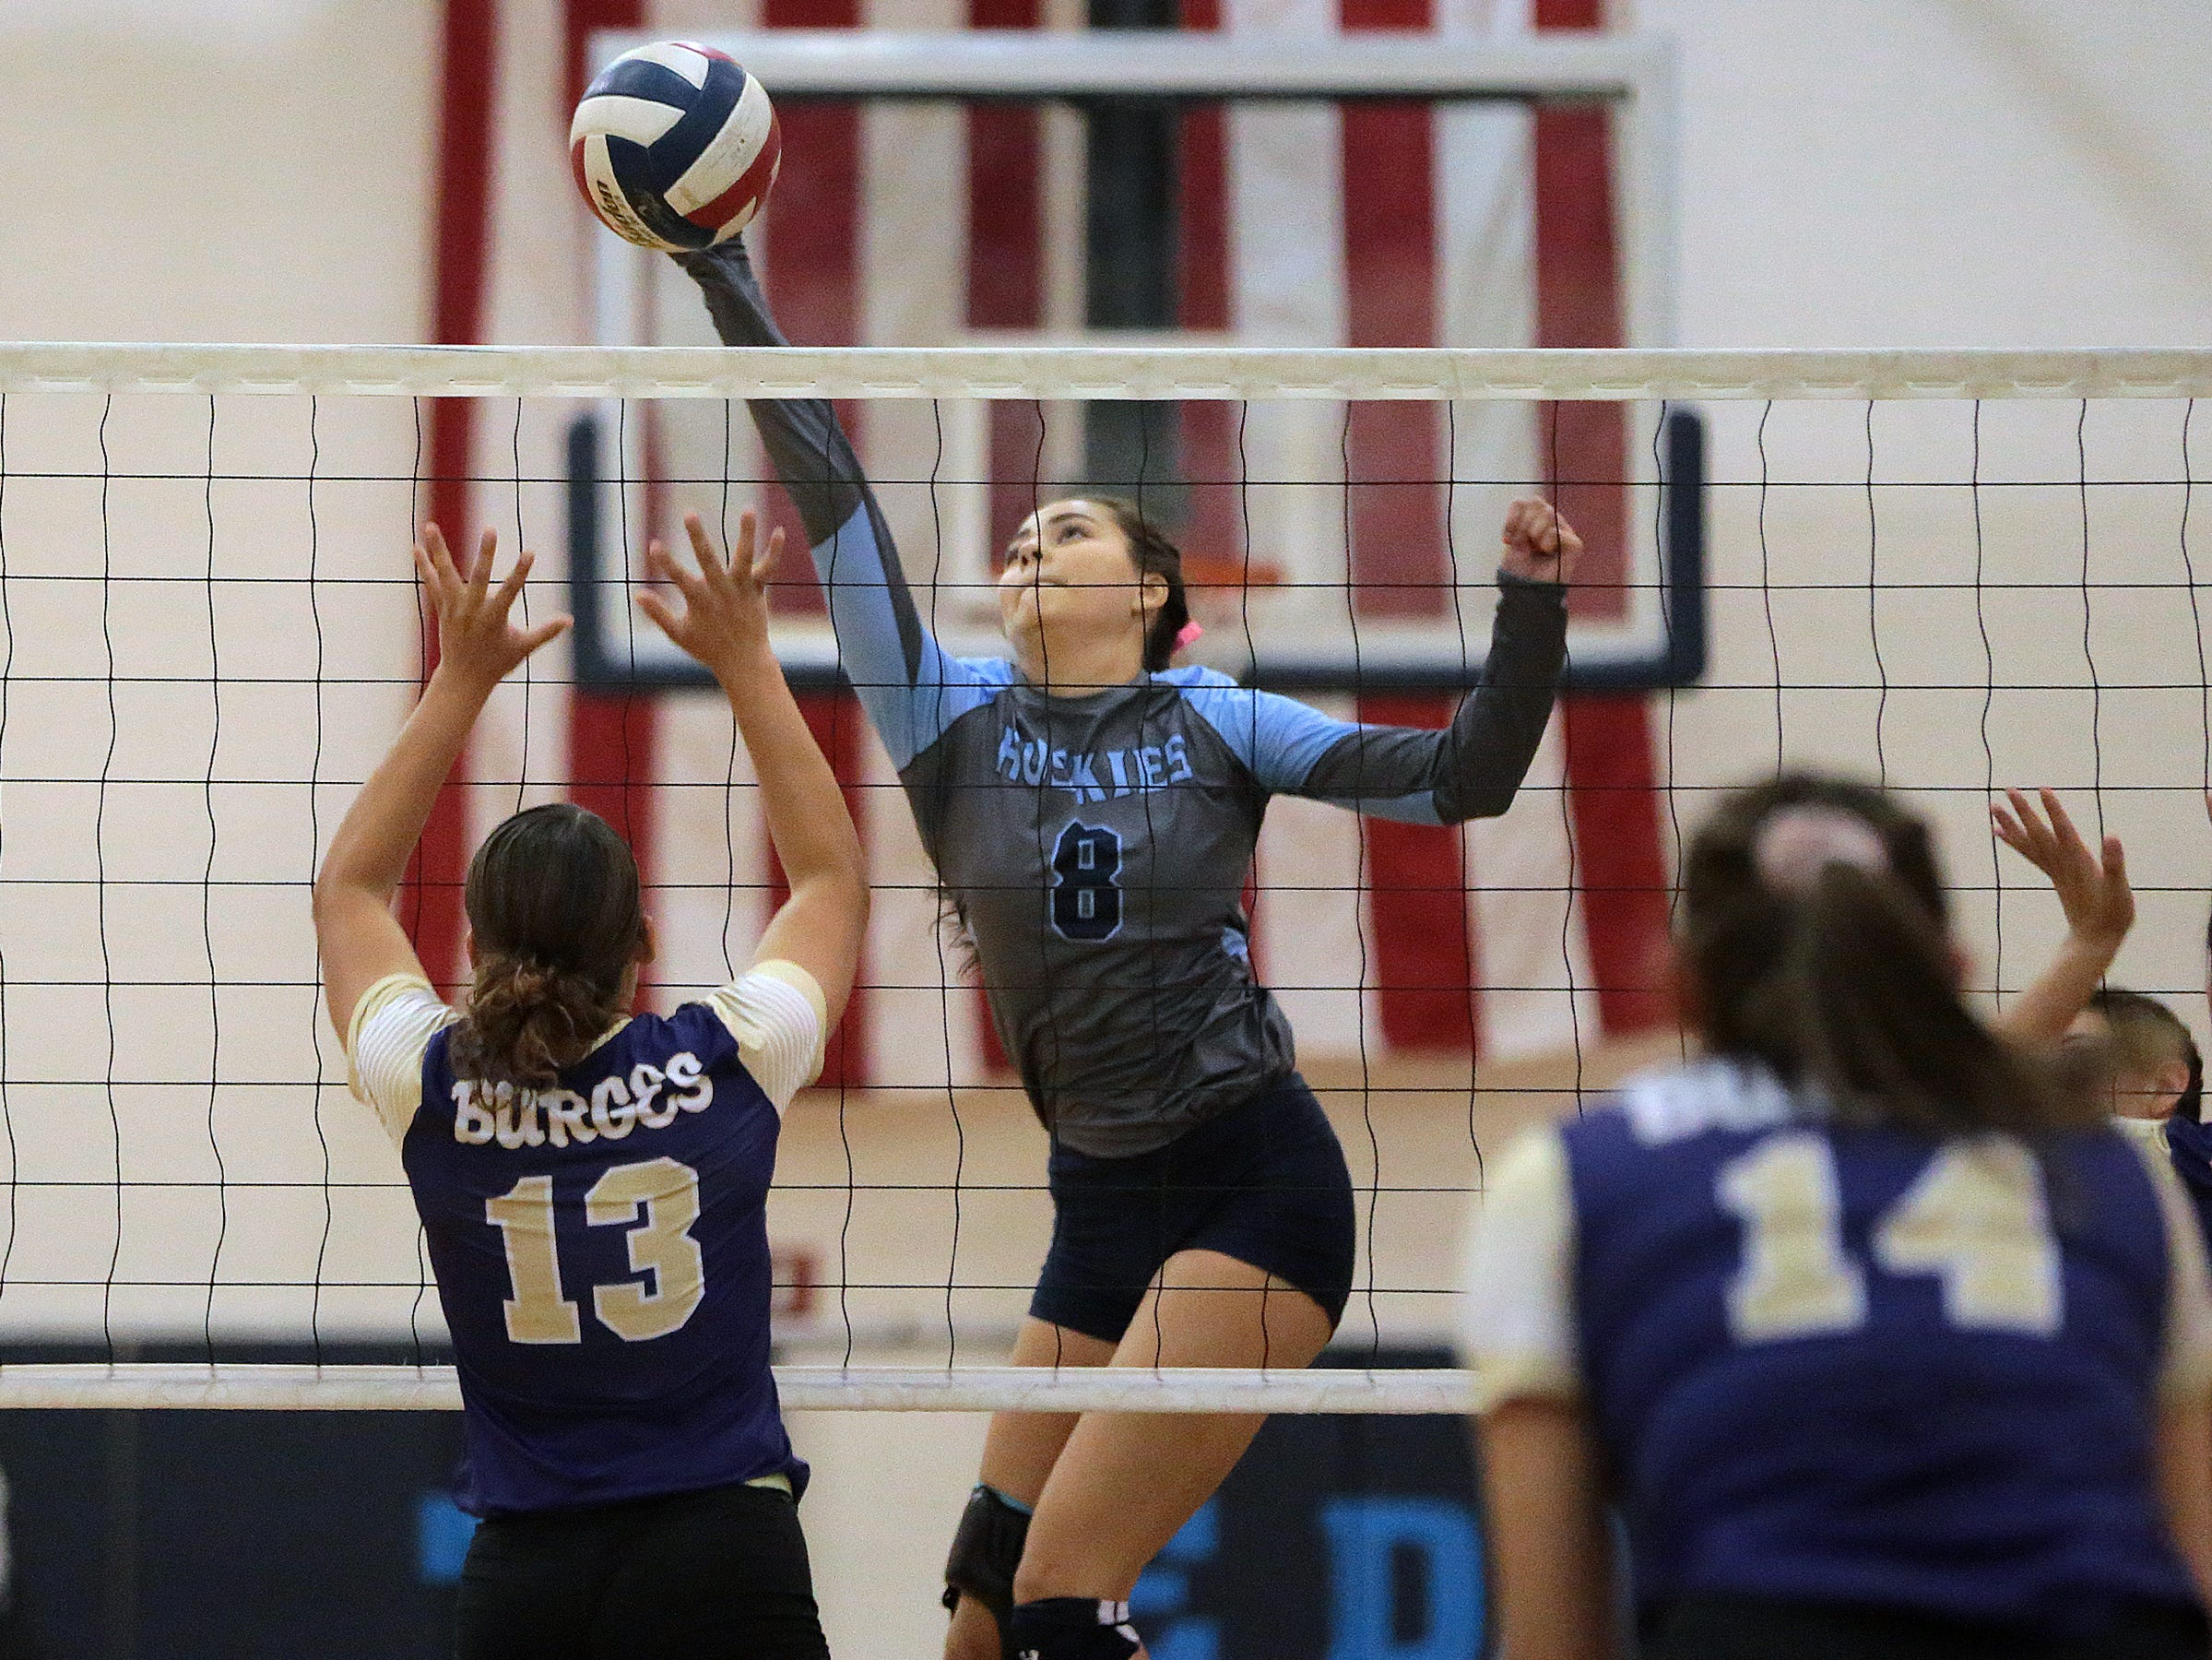 Chapin's Vivien Marquez hits a wayward ball over Meghan Cereceres of Burges.